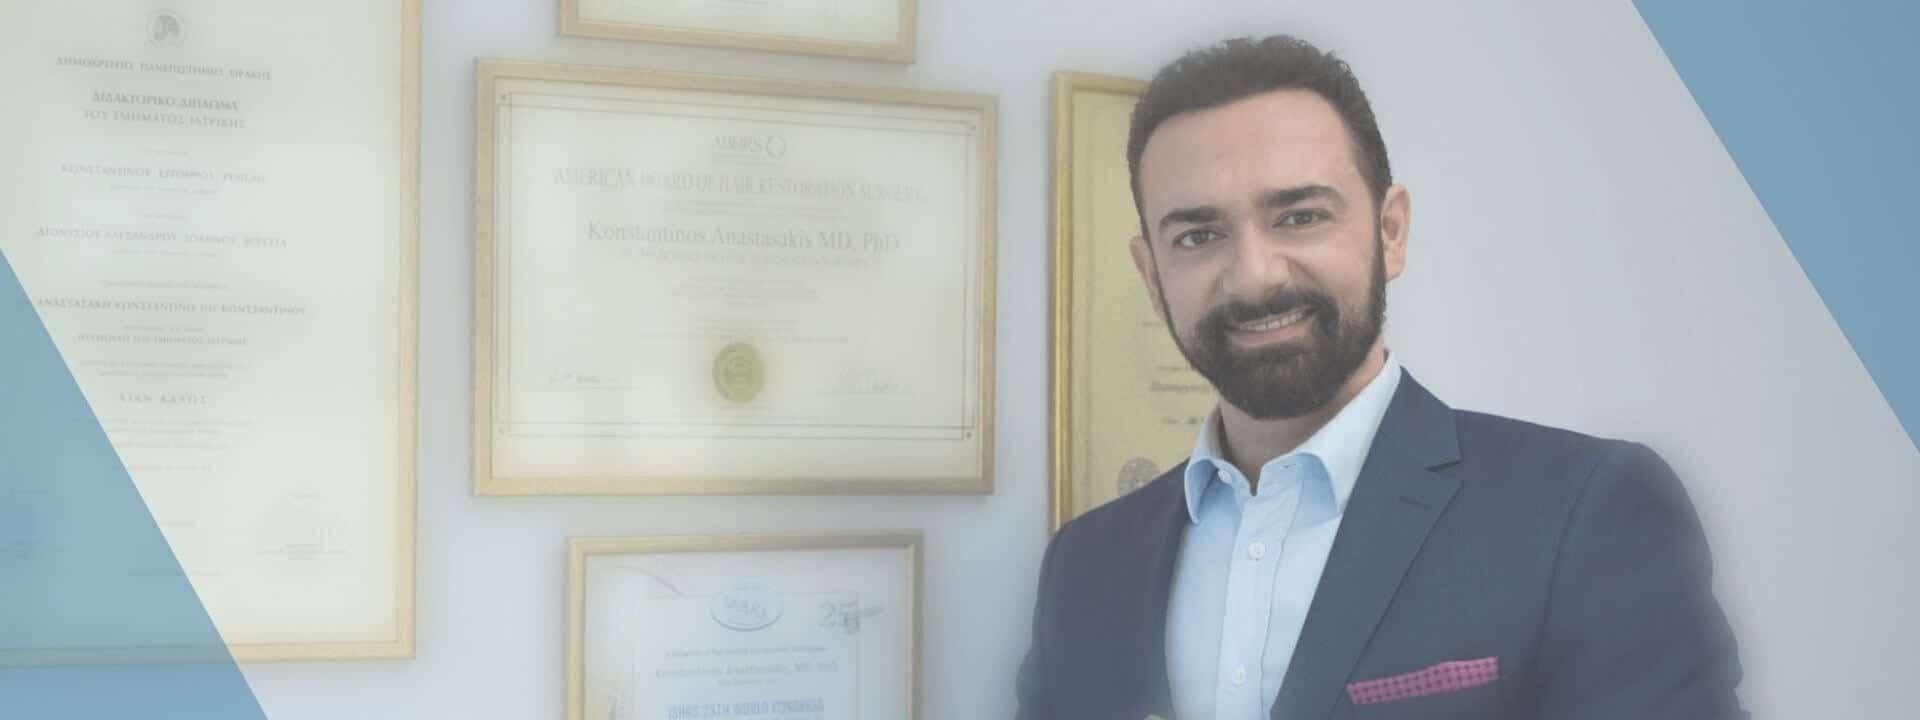 dr-anastasakis-md-phd-fishrs-abhrs